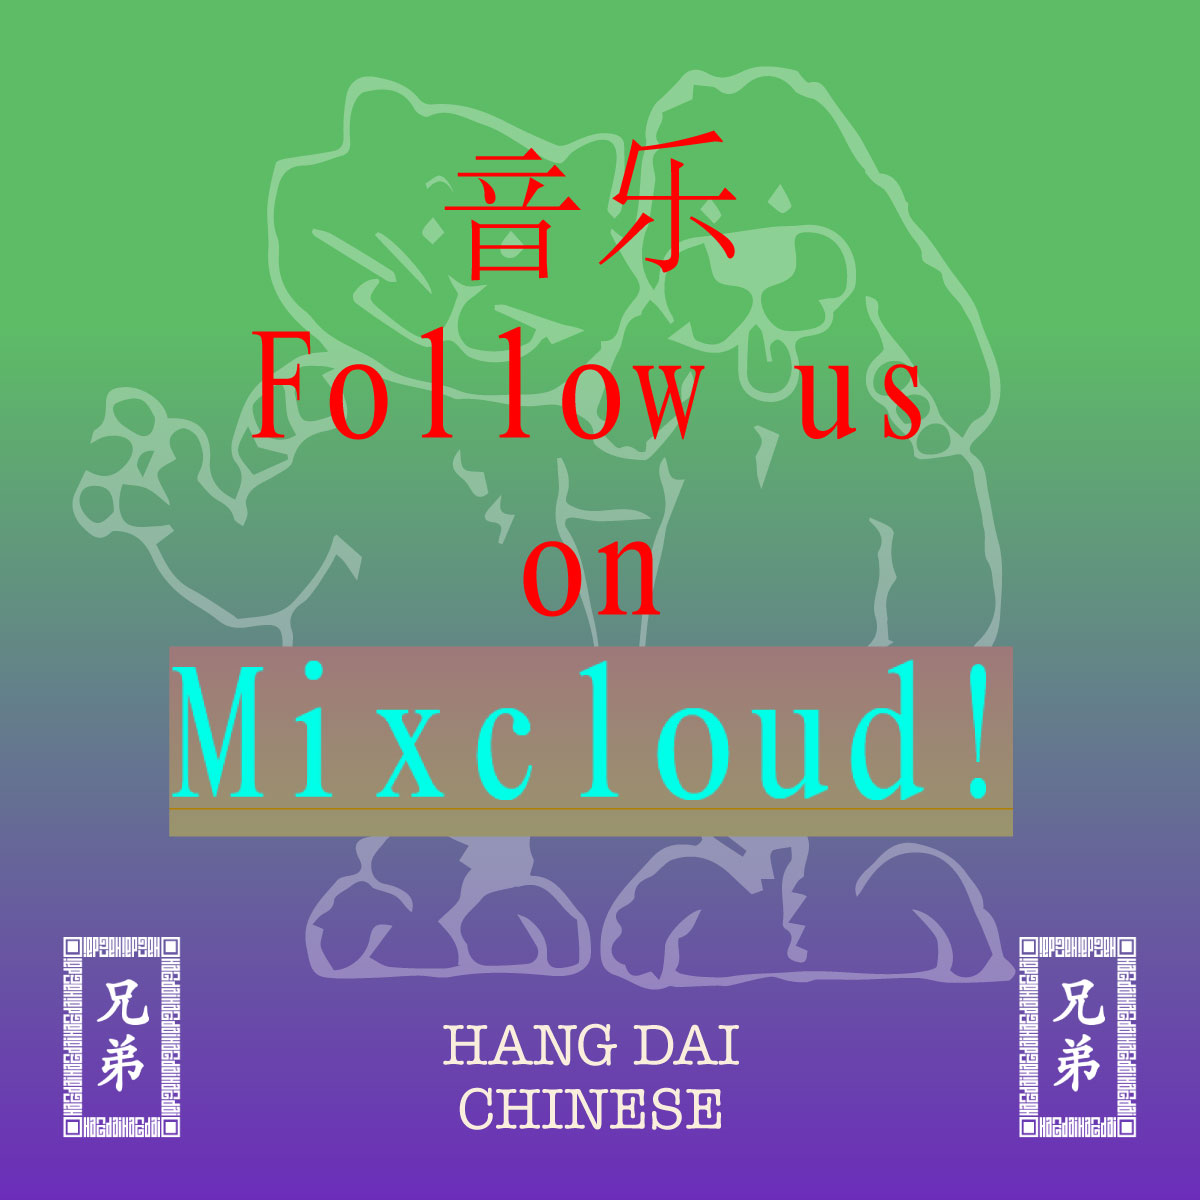 HangDai-Mixcloud-Follow-us.jpg